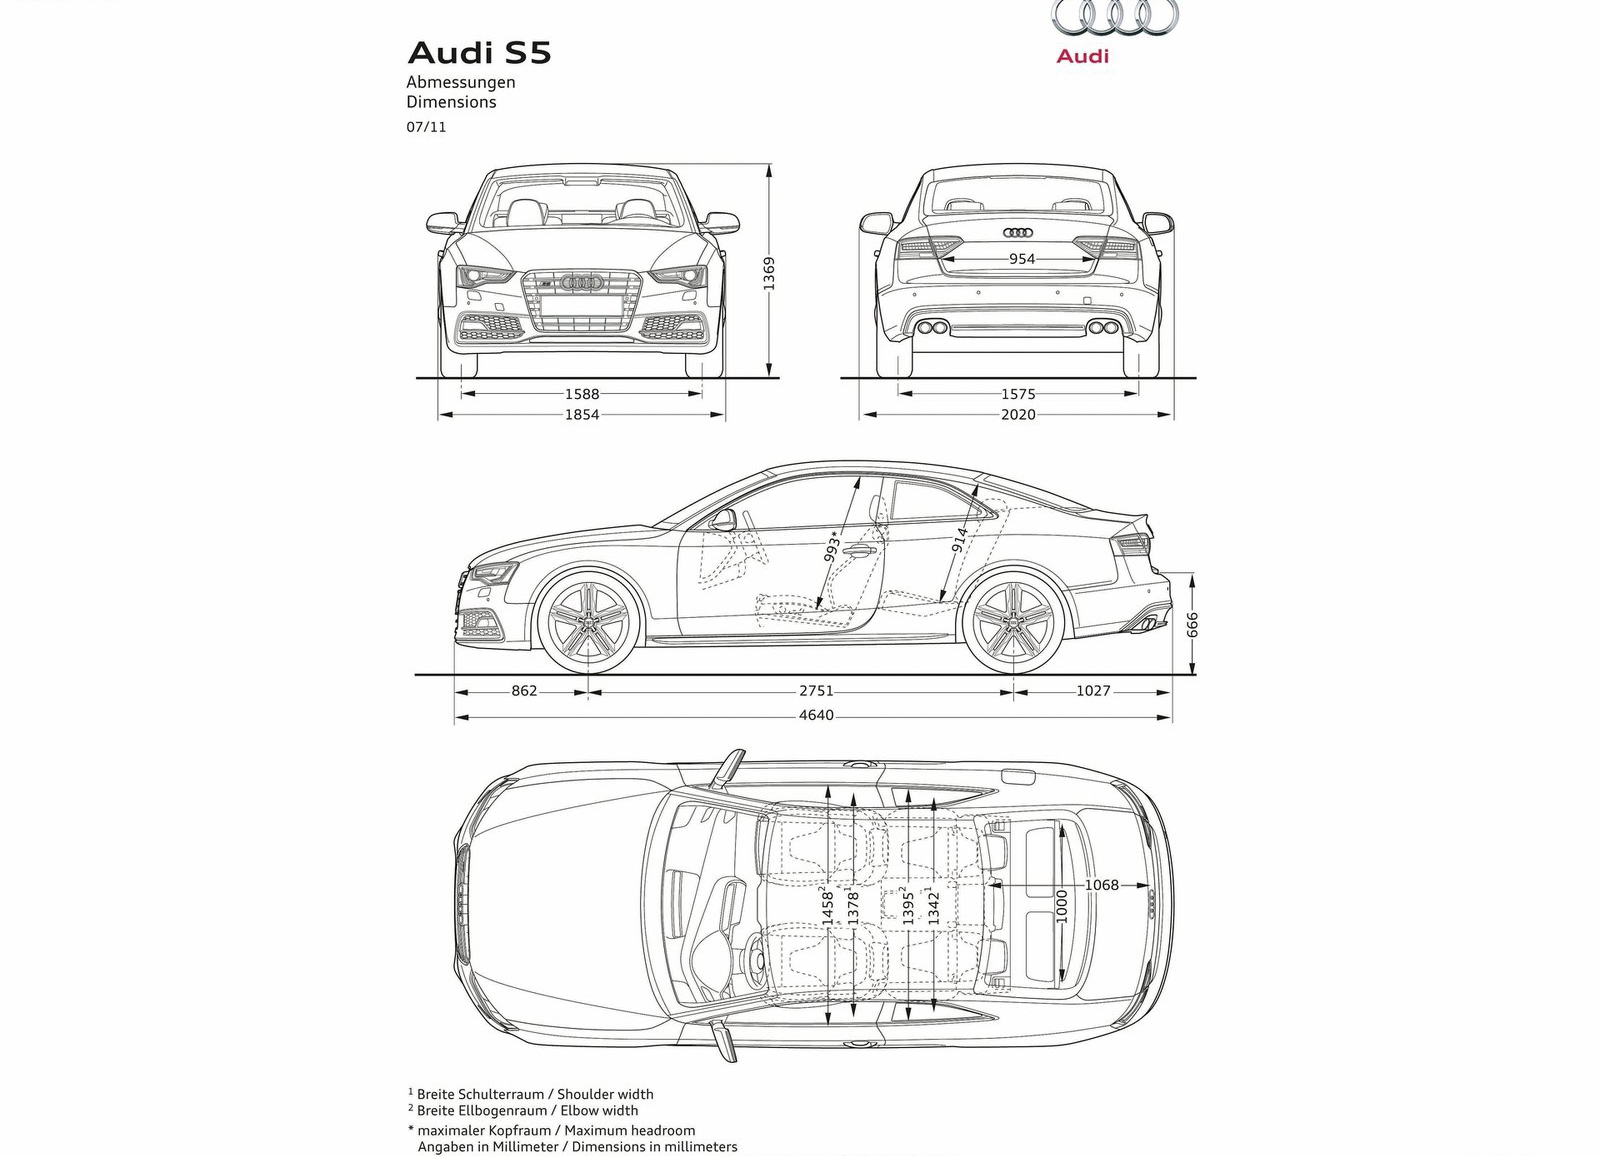 2012 Audi S5 HD wallpaper